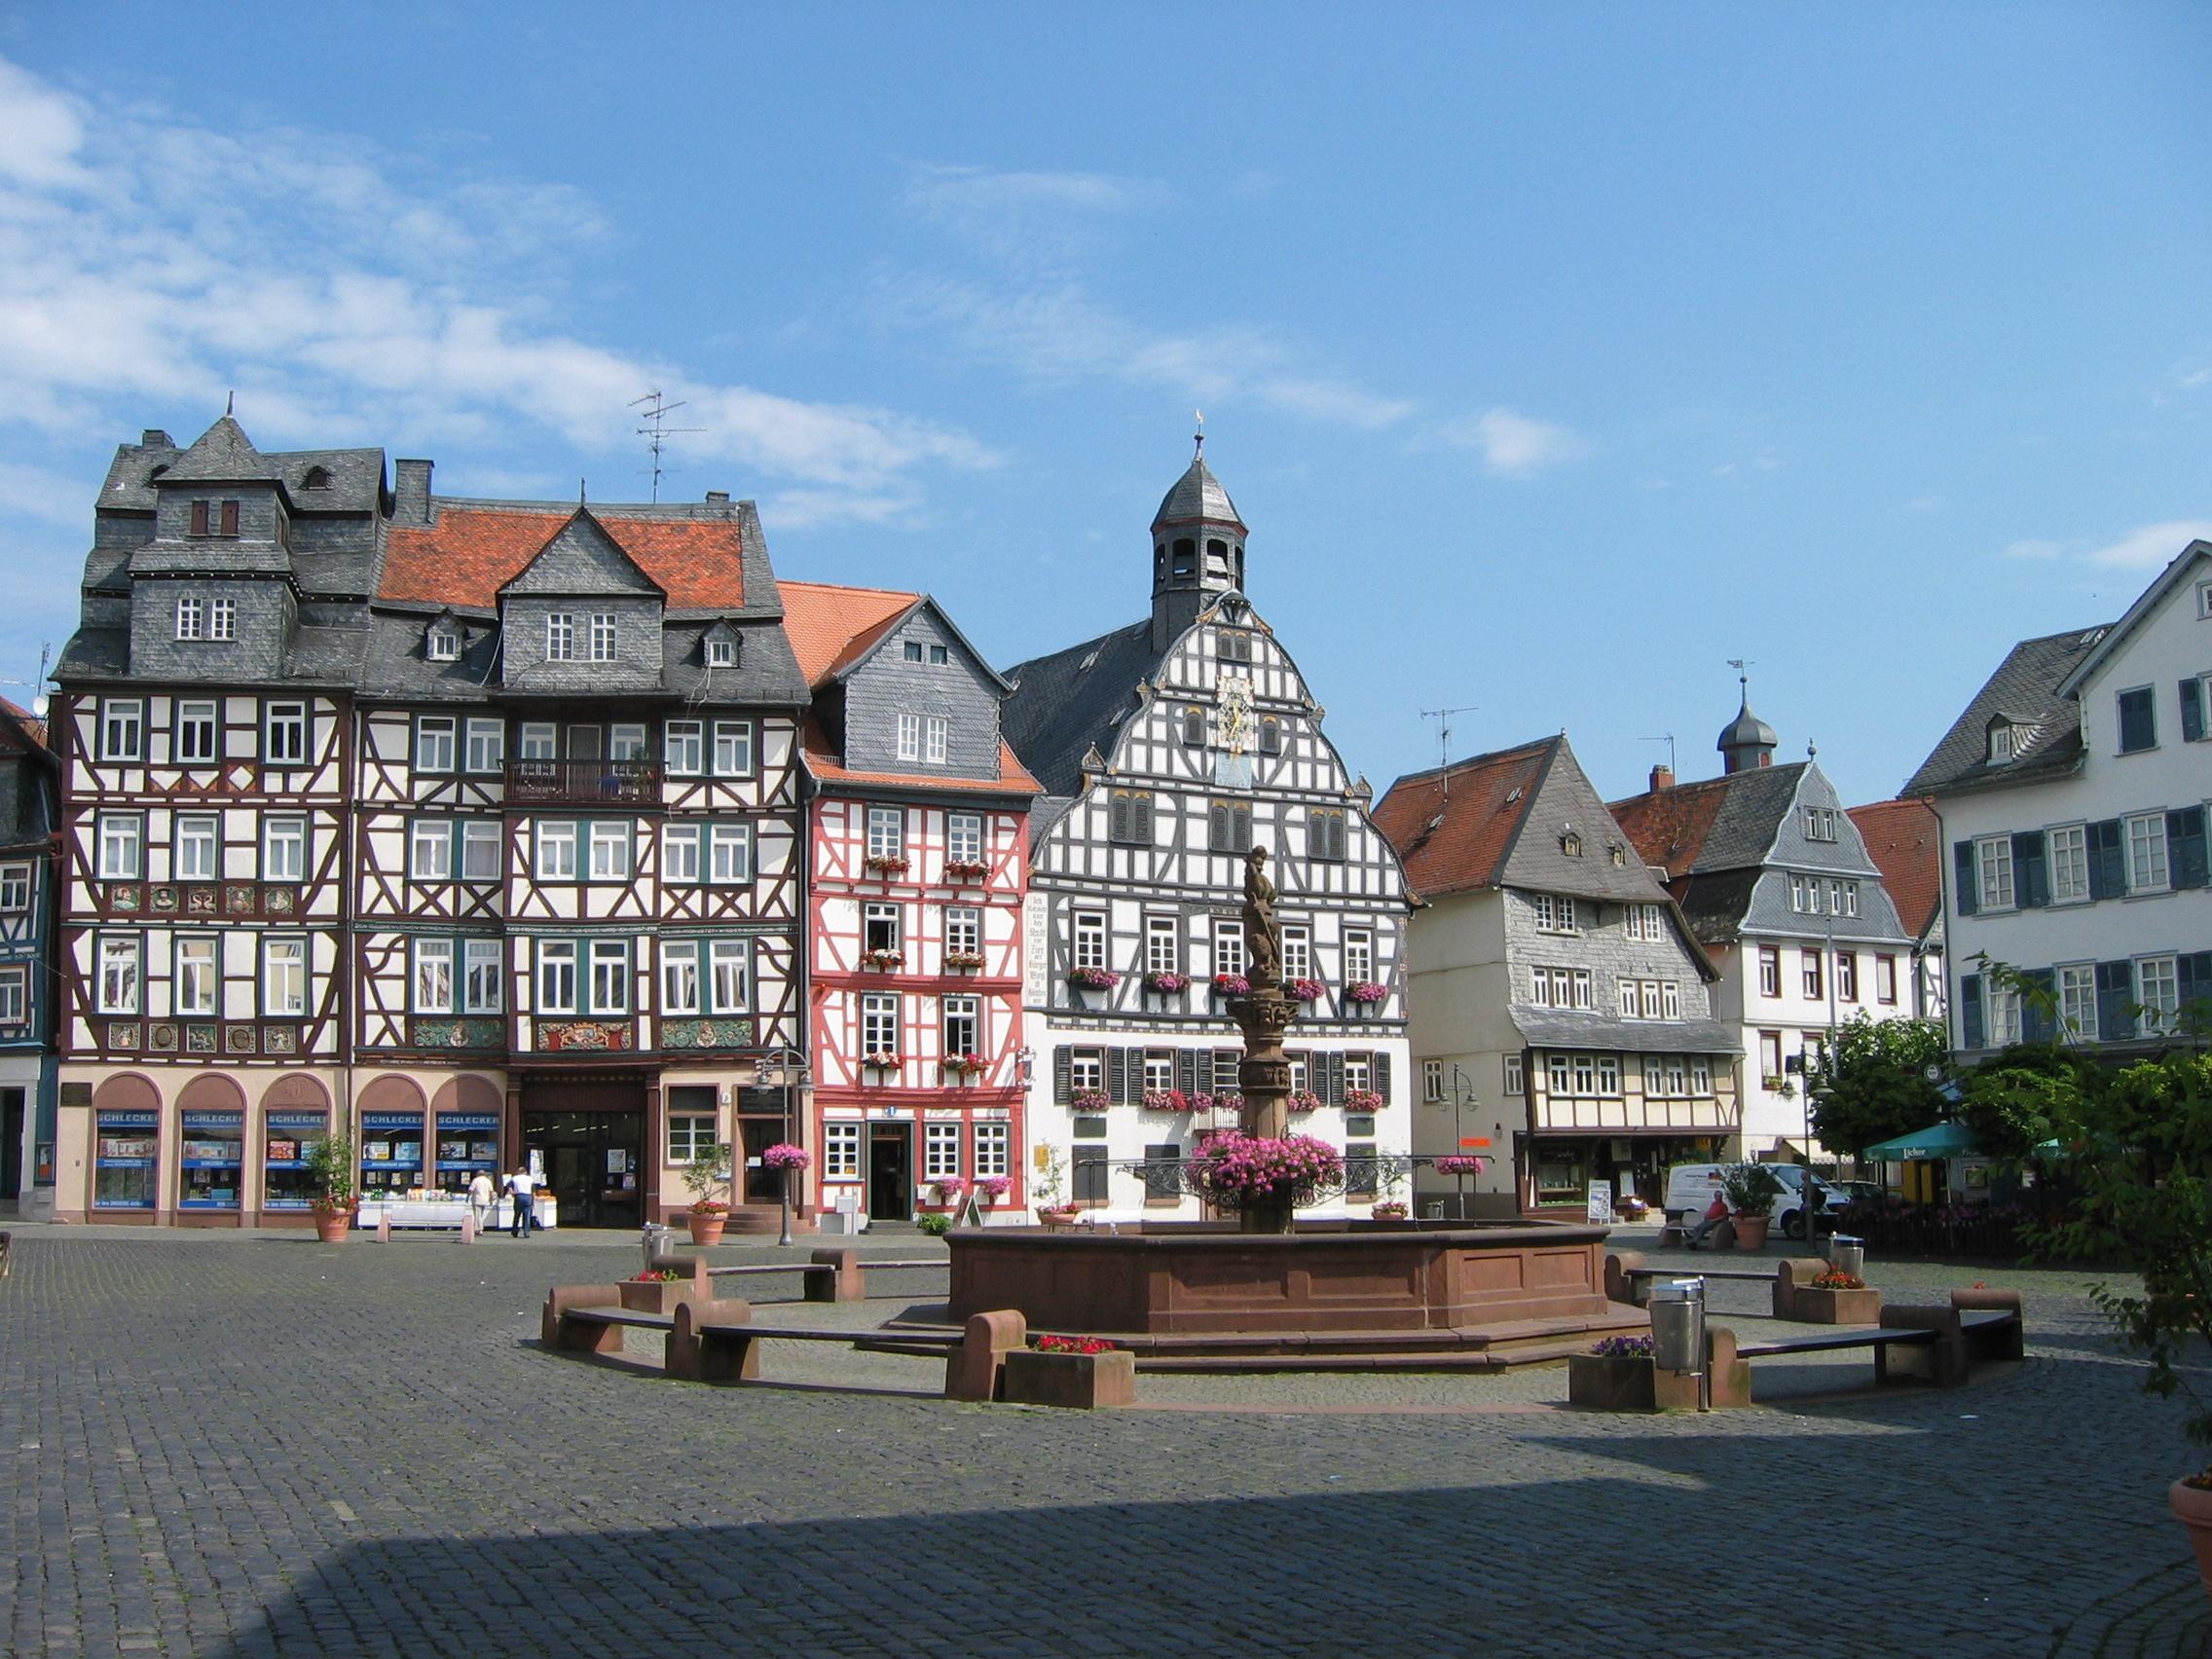 File:Butzbach-Marktplatz.jpg - Wikimedia Commons